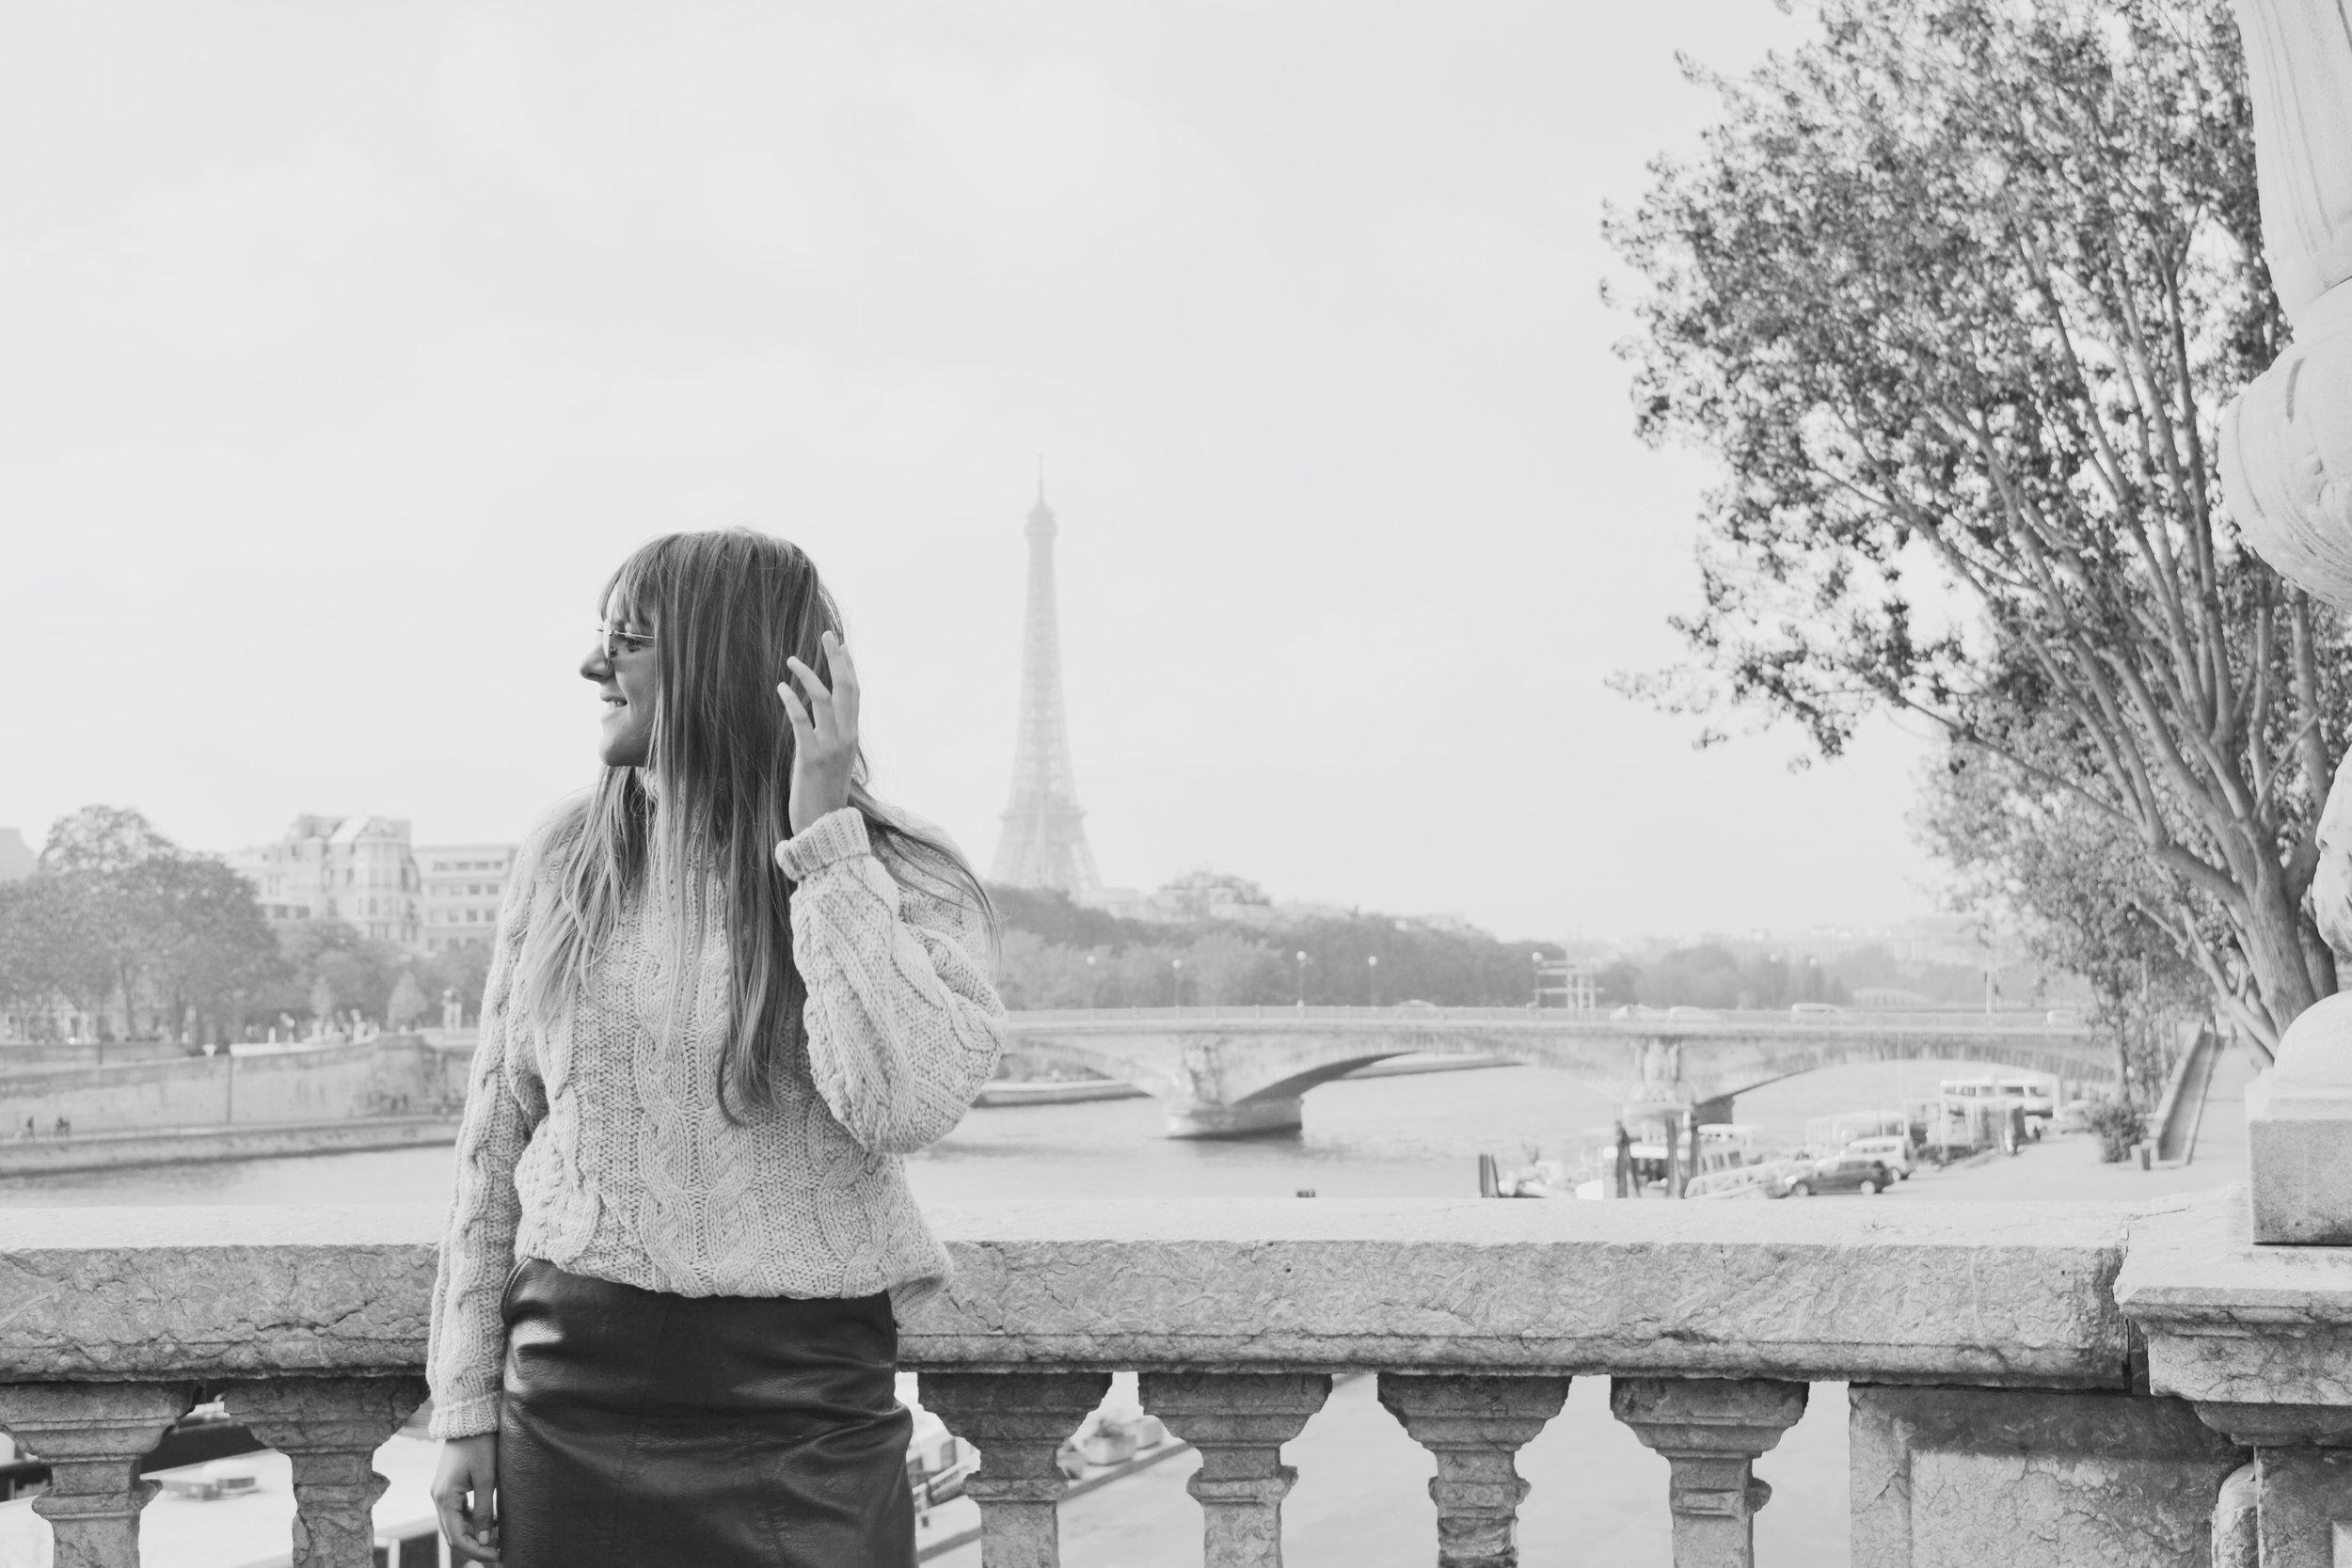 photo-pont-alexandre-III-eiffel-tower-in-background